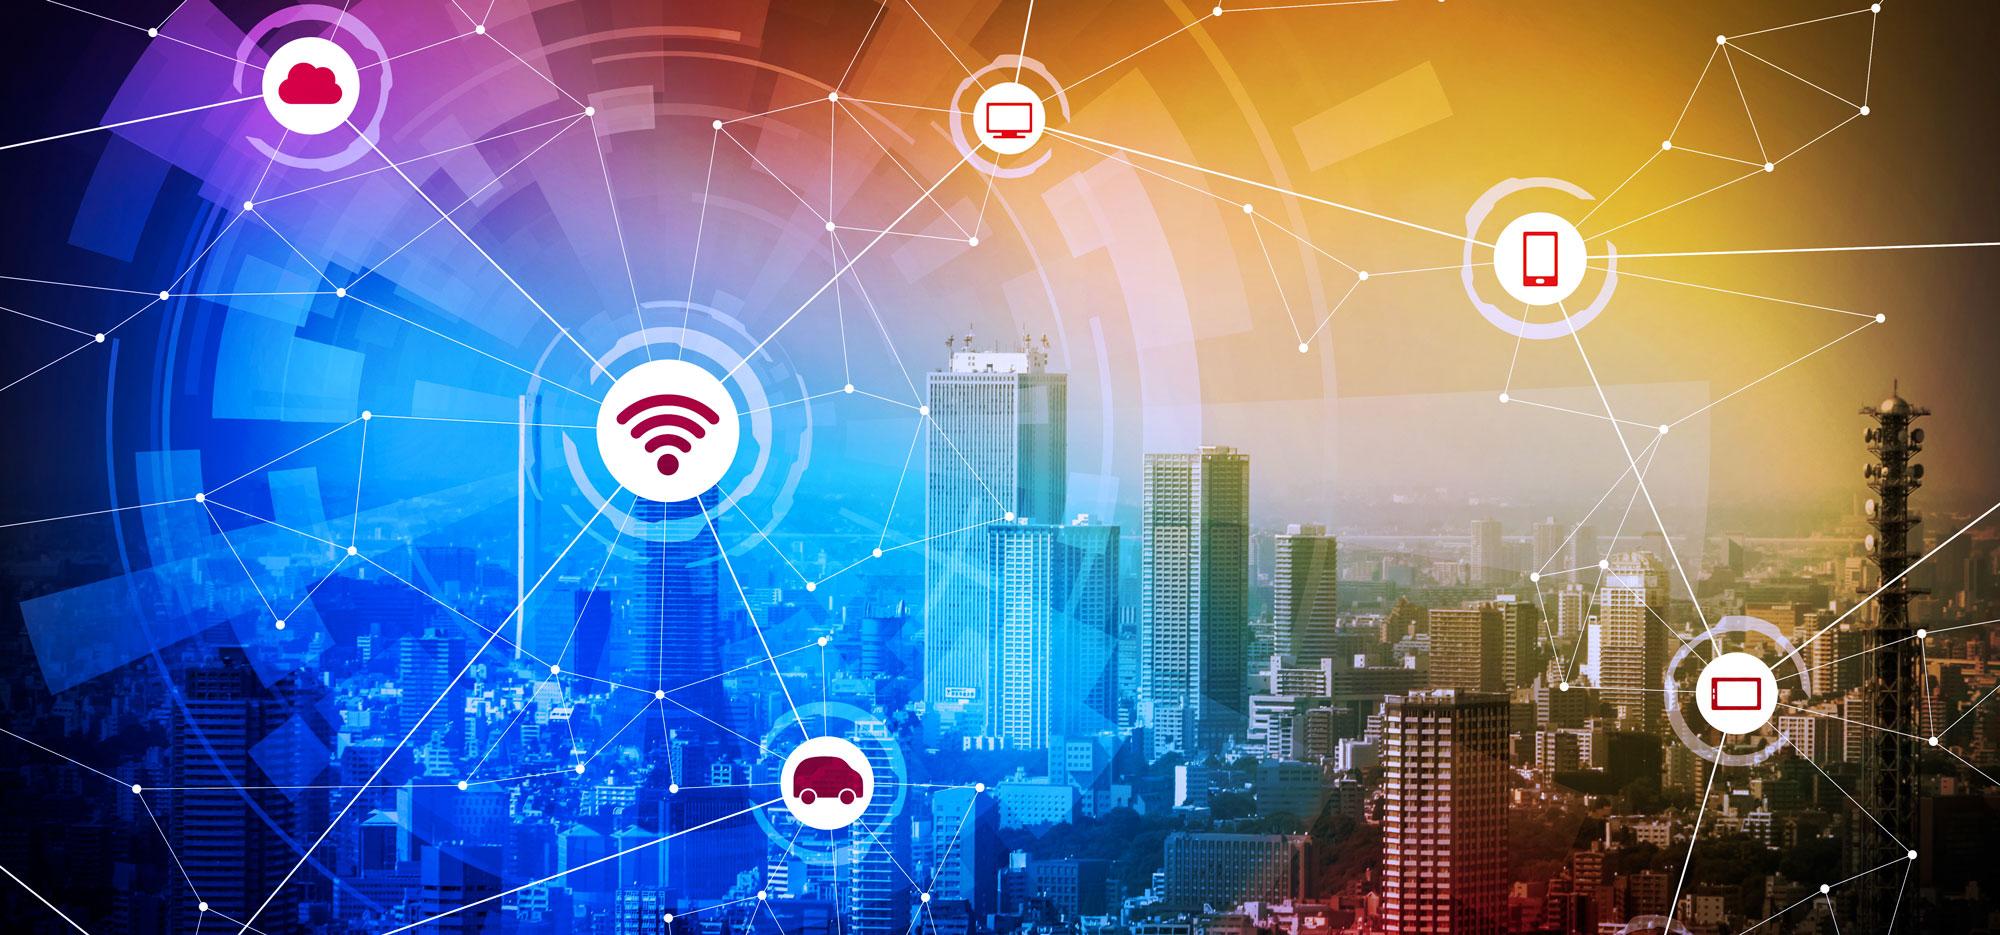 umbrianet-internet-service-provider-italia